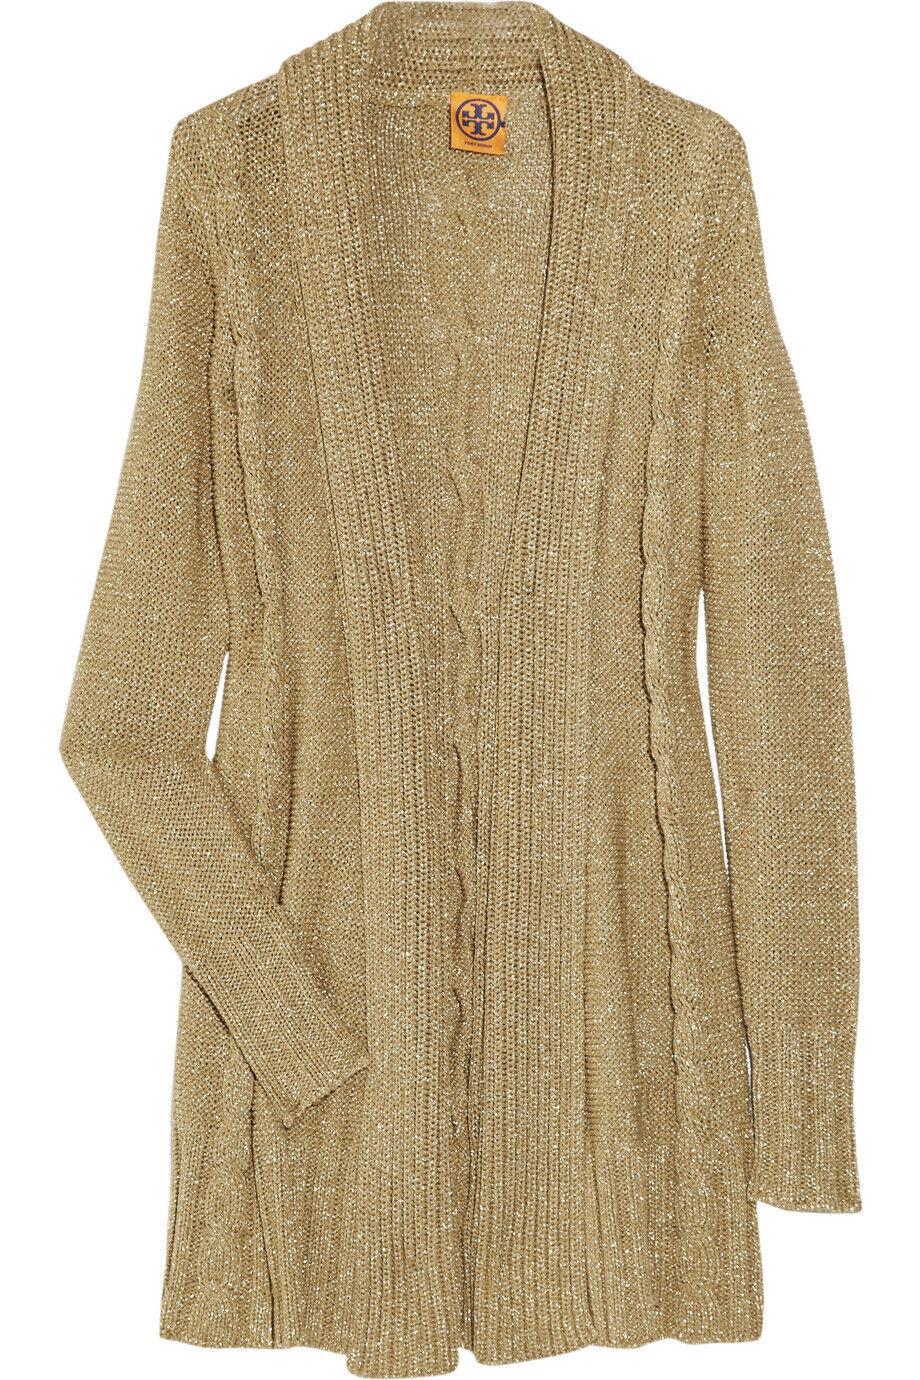 345 Tory Burch Anouk gold lurex metallic knitted open cardigan S